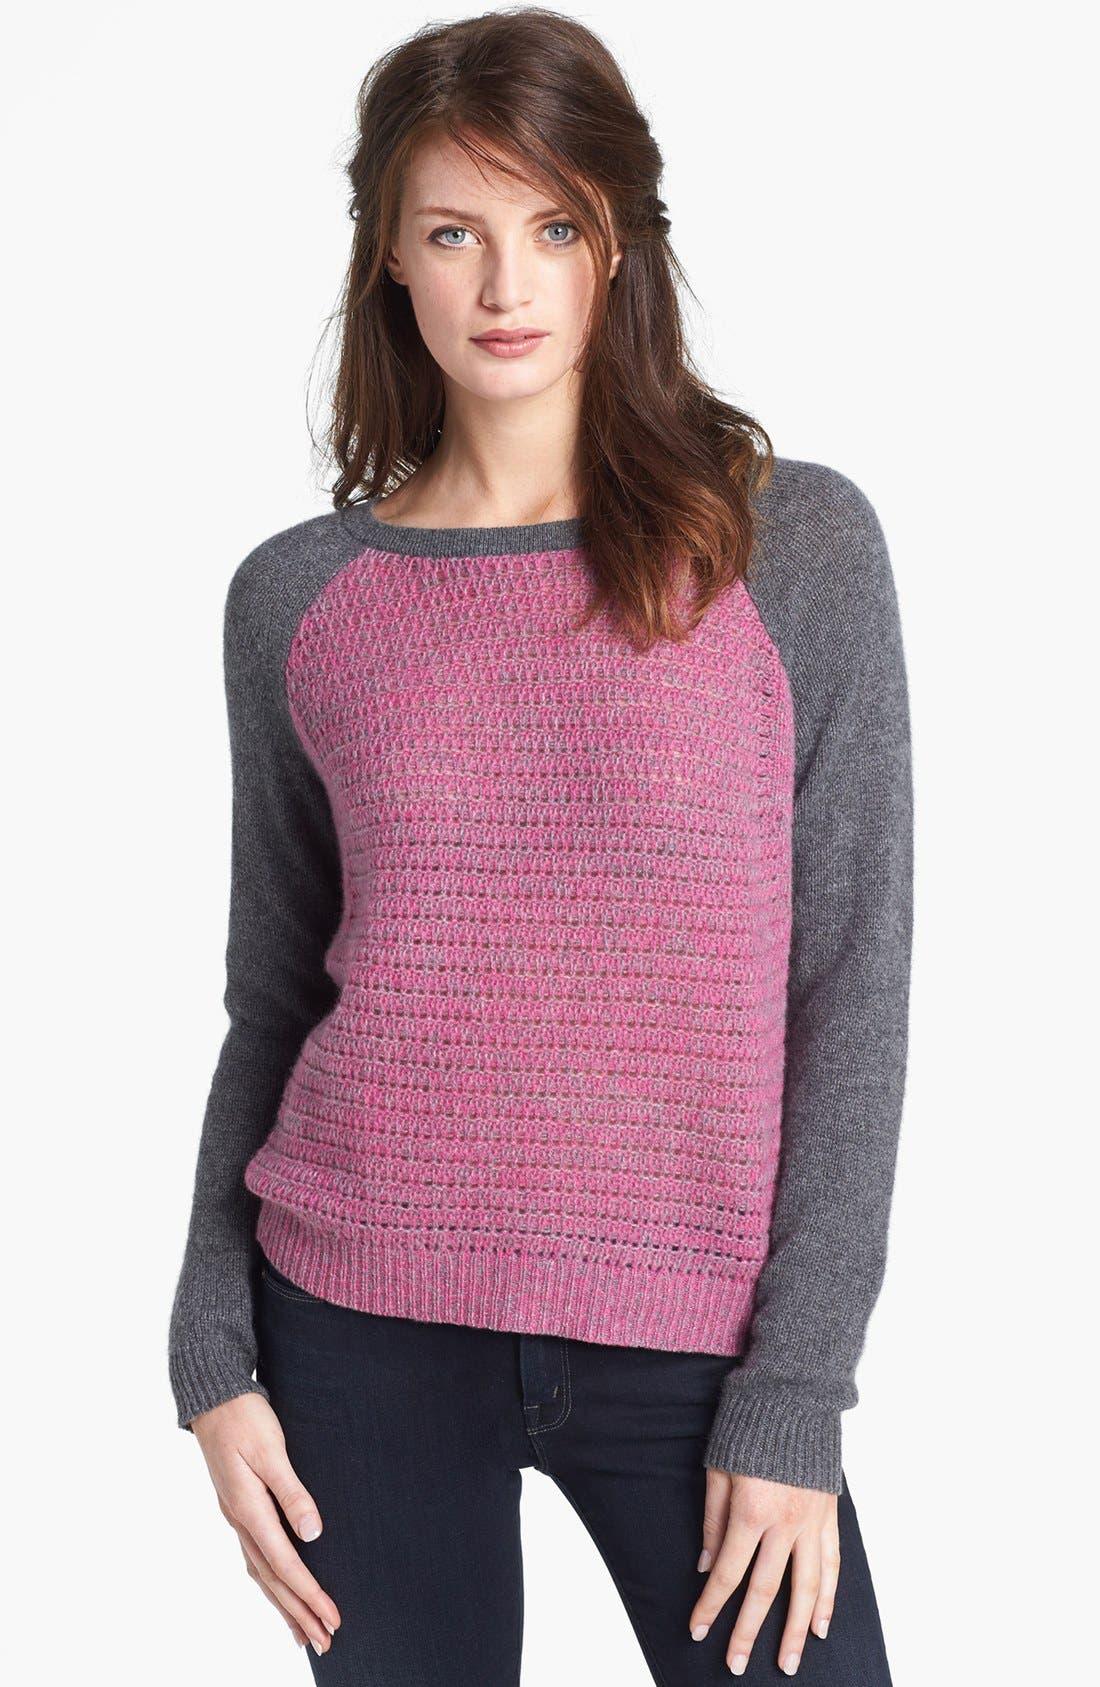 Alternate Image 1 Selected - Diane von Furstenberg 'Nanette' Cashmere Sweater